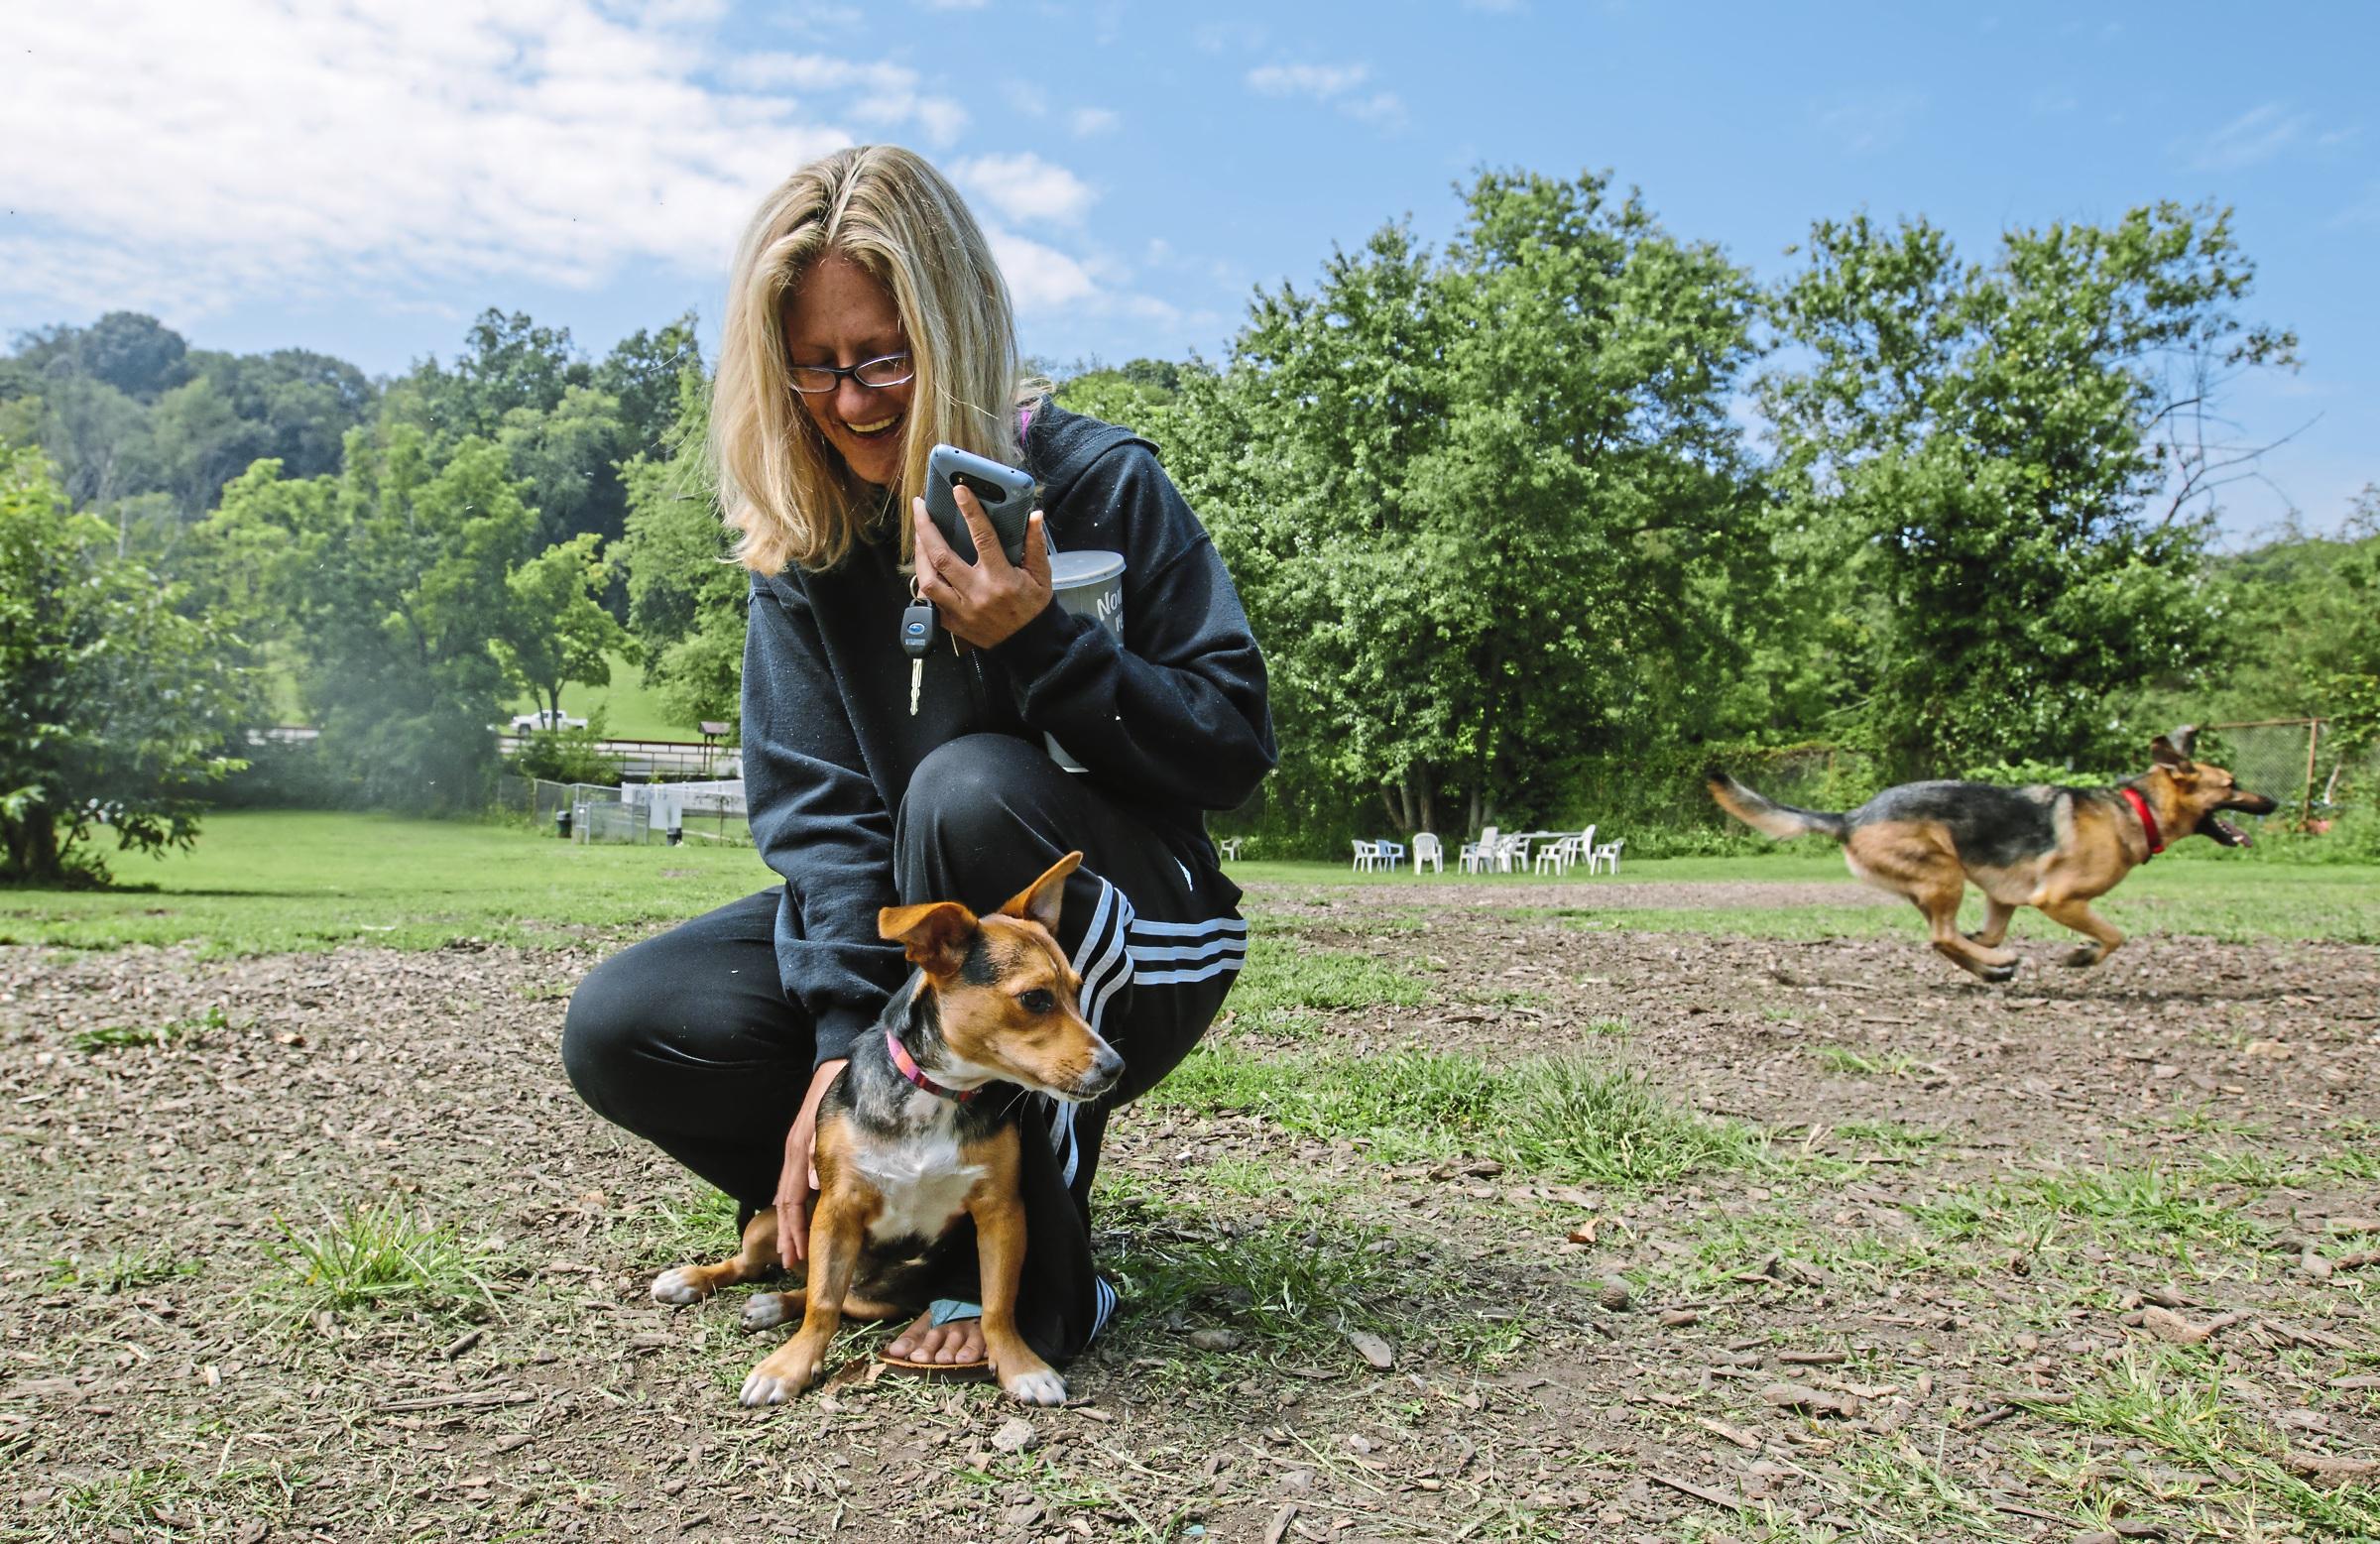 20170829arDogParks03-2 Emily Kiener of Bethel Park with her dog, Madison, at the South Park Dog Park.